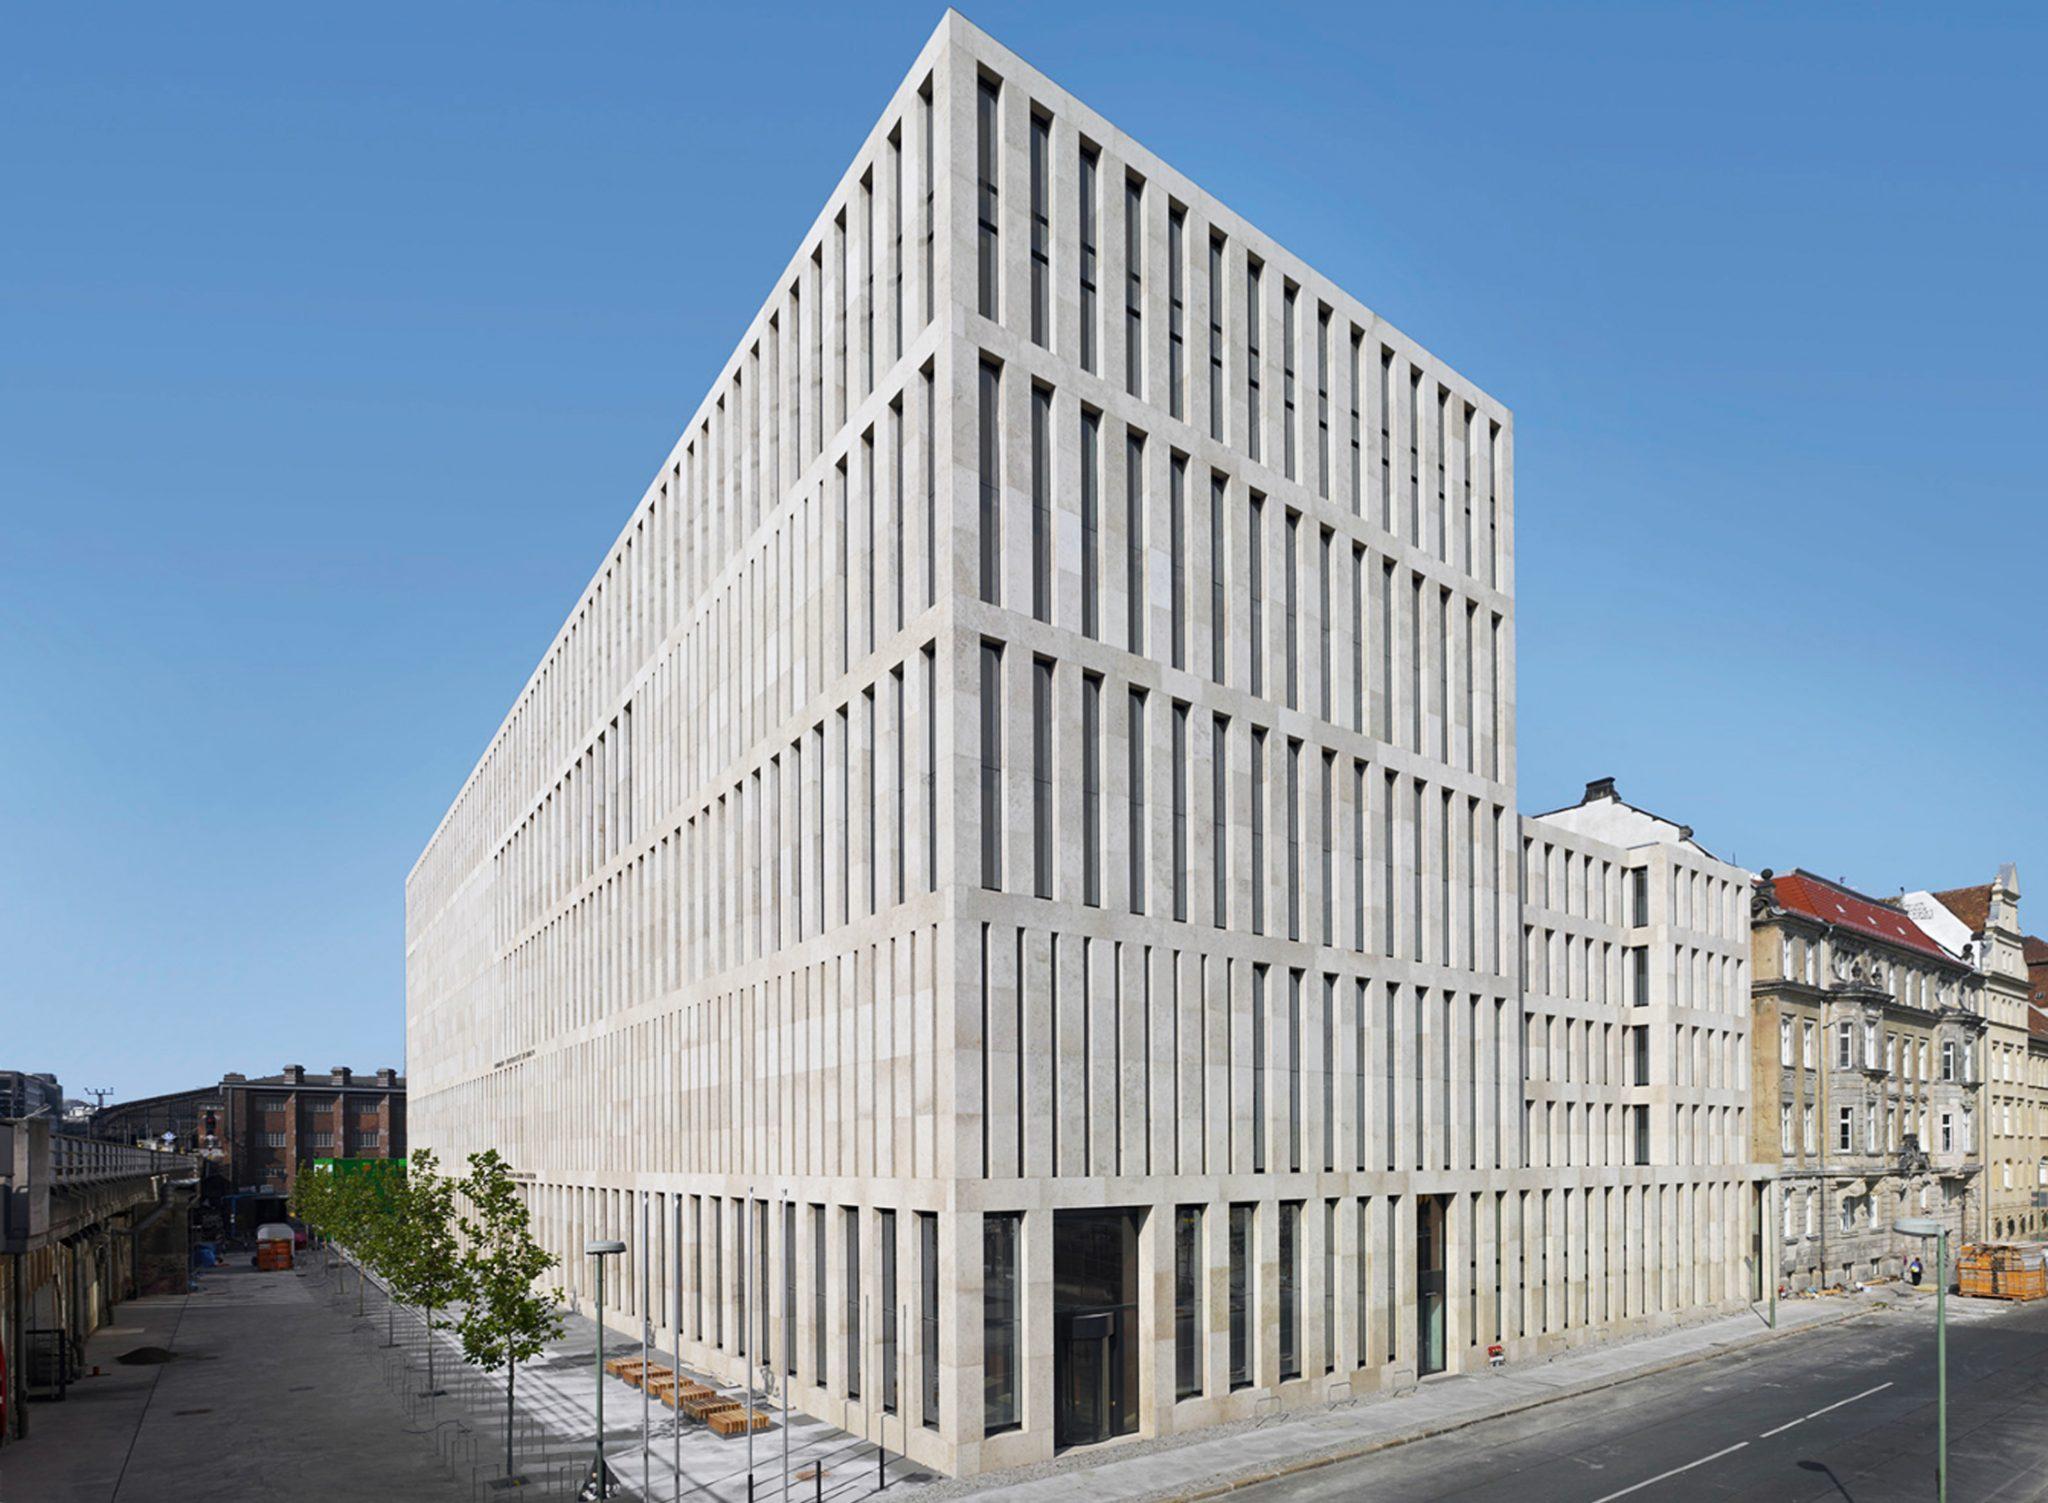 030a biblioteka 1 - Berlin - Architour